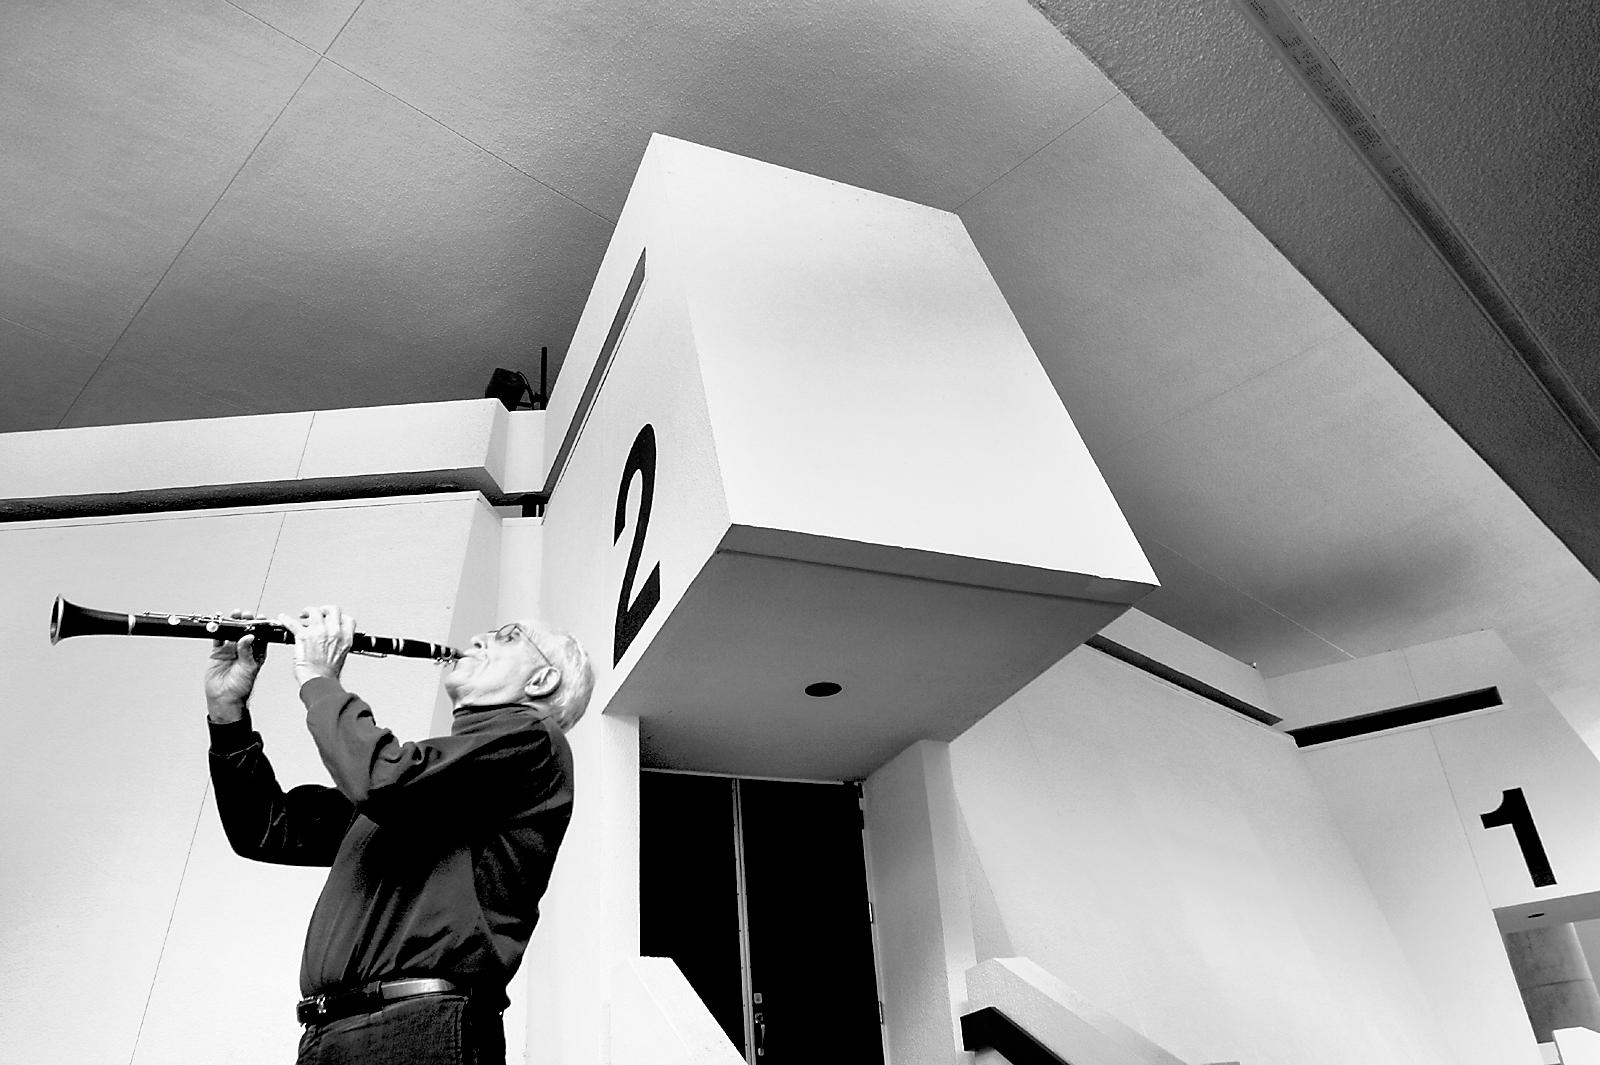 David Kaun,UCSC Economics Professor &Philanthropist/Photo by Shmuel Thaler